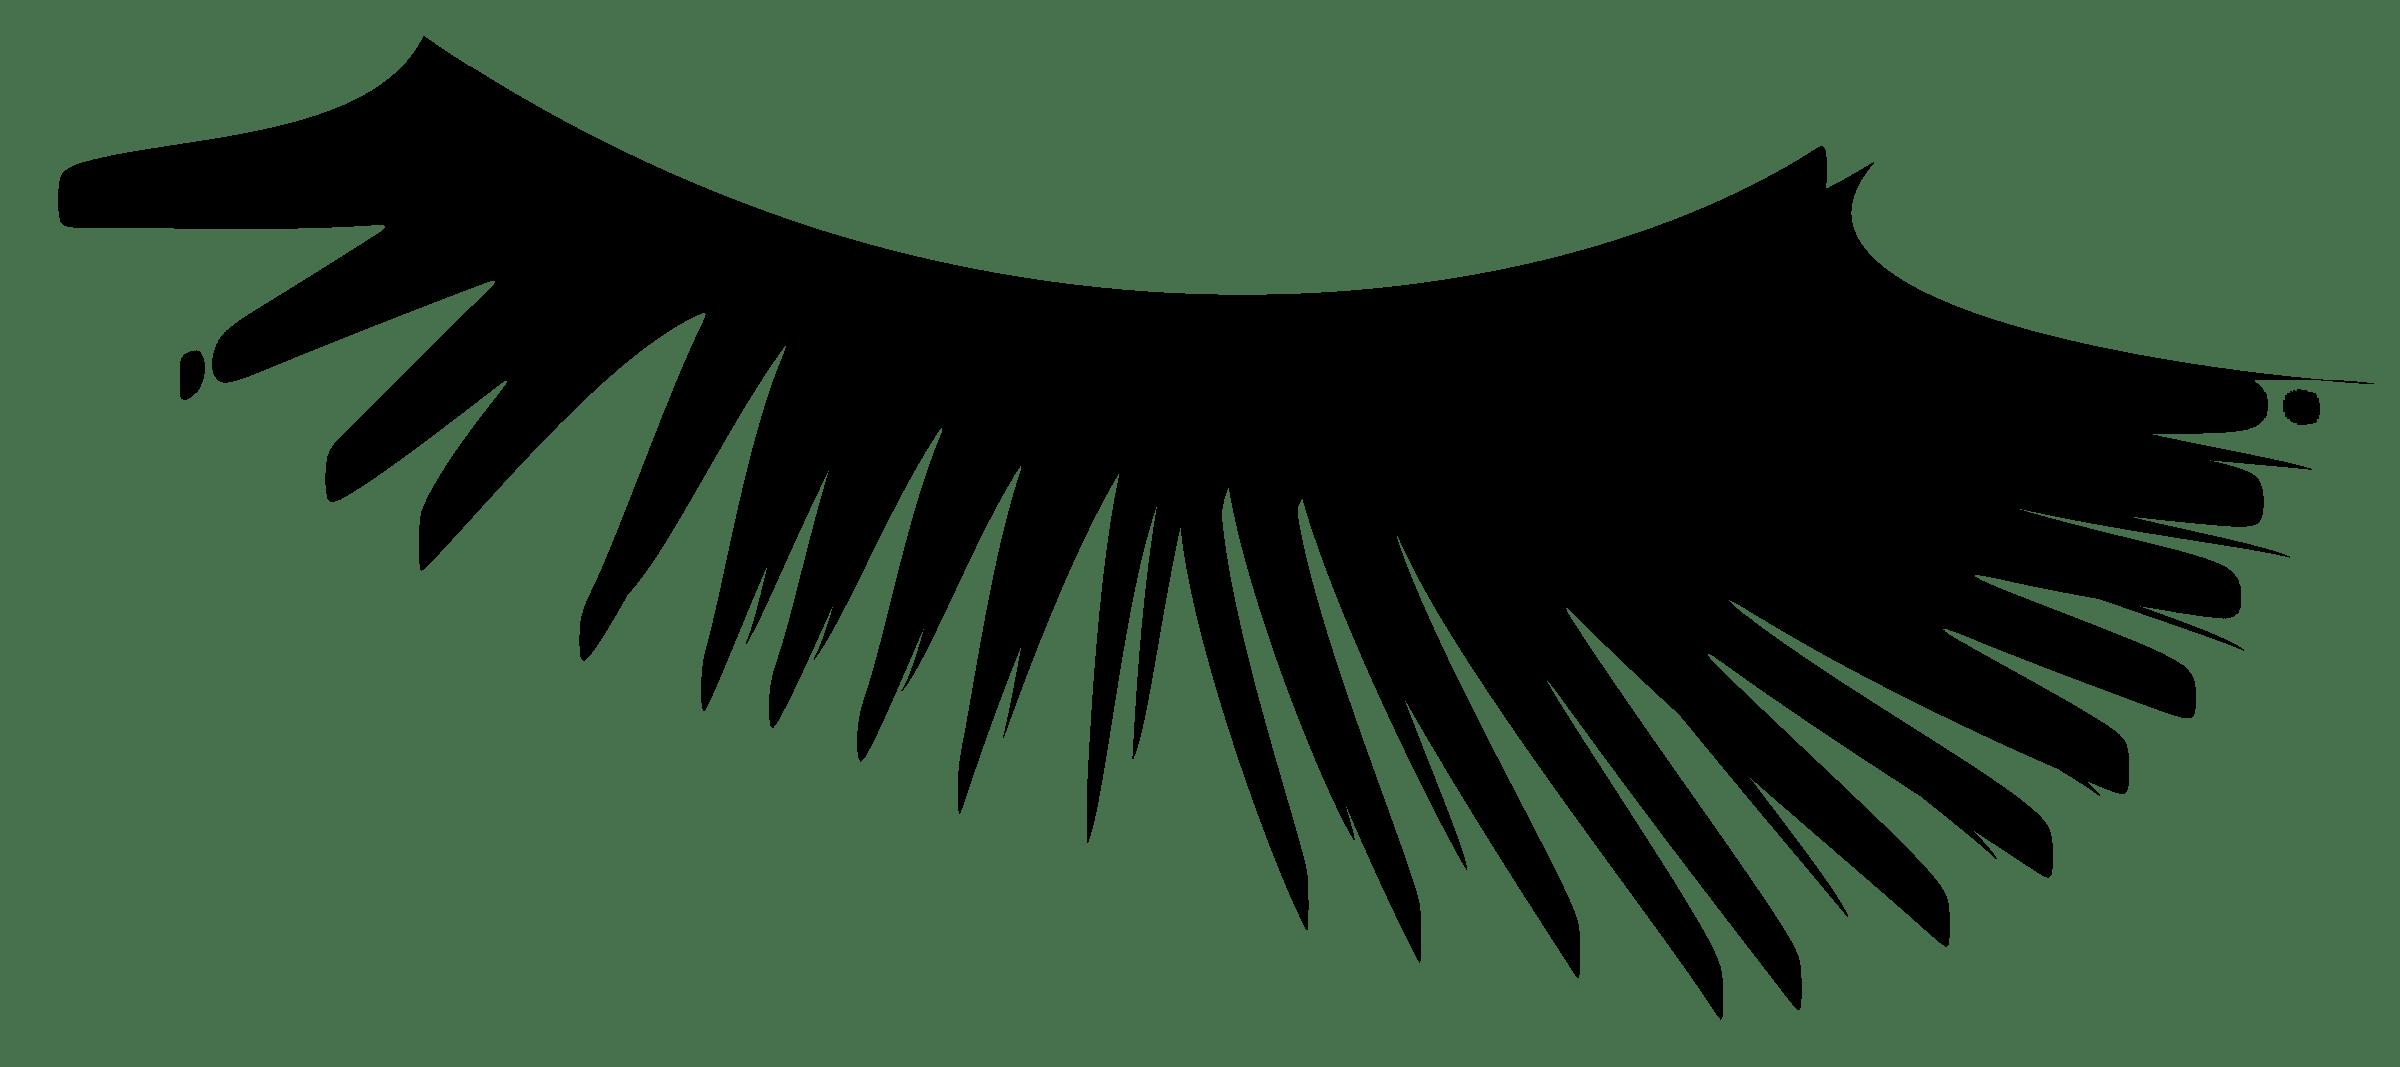 Eyelashes Clipart Printable Eyelashes Printable